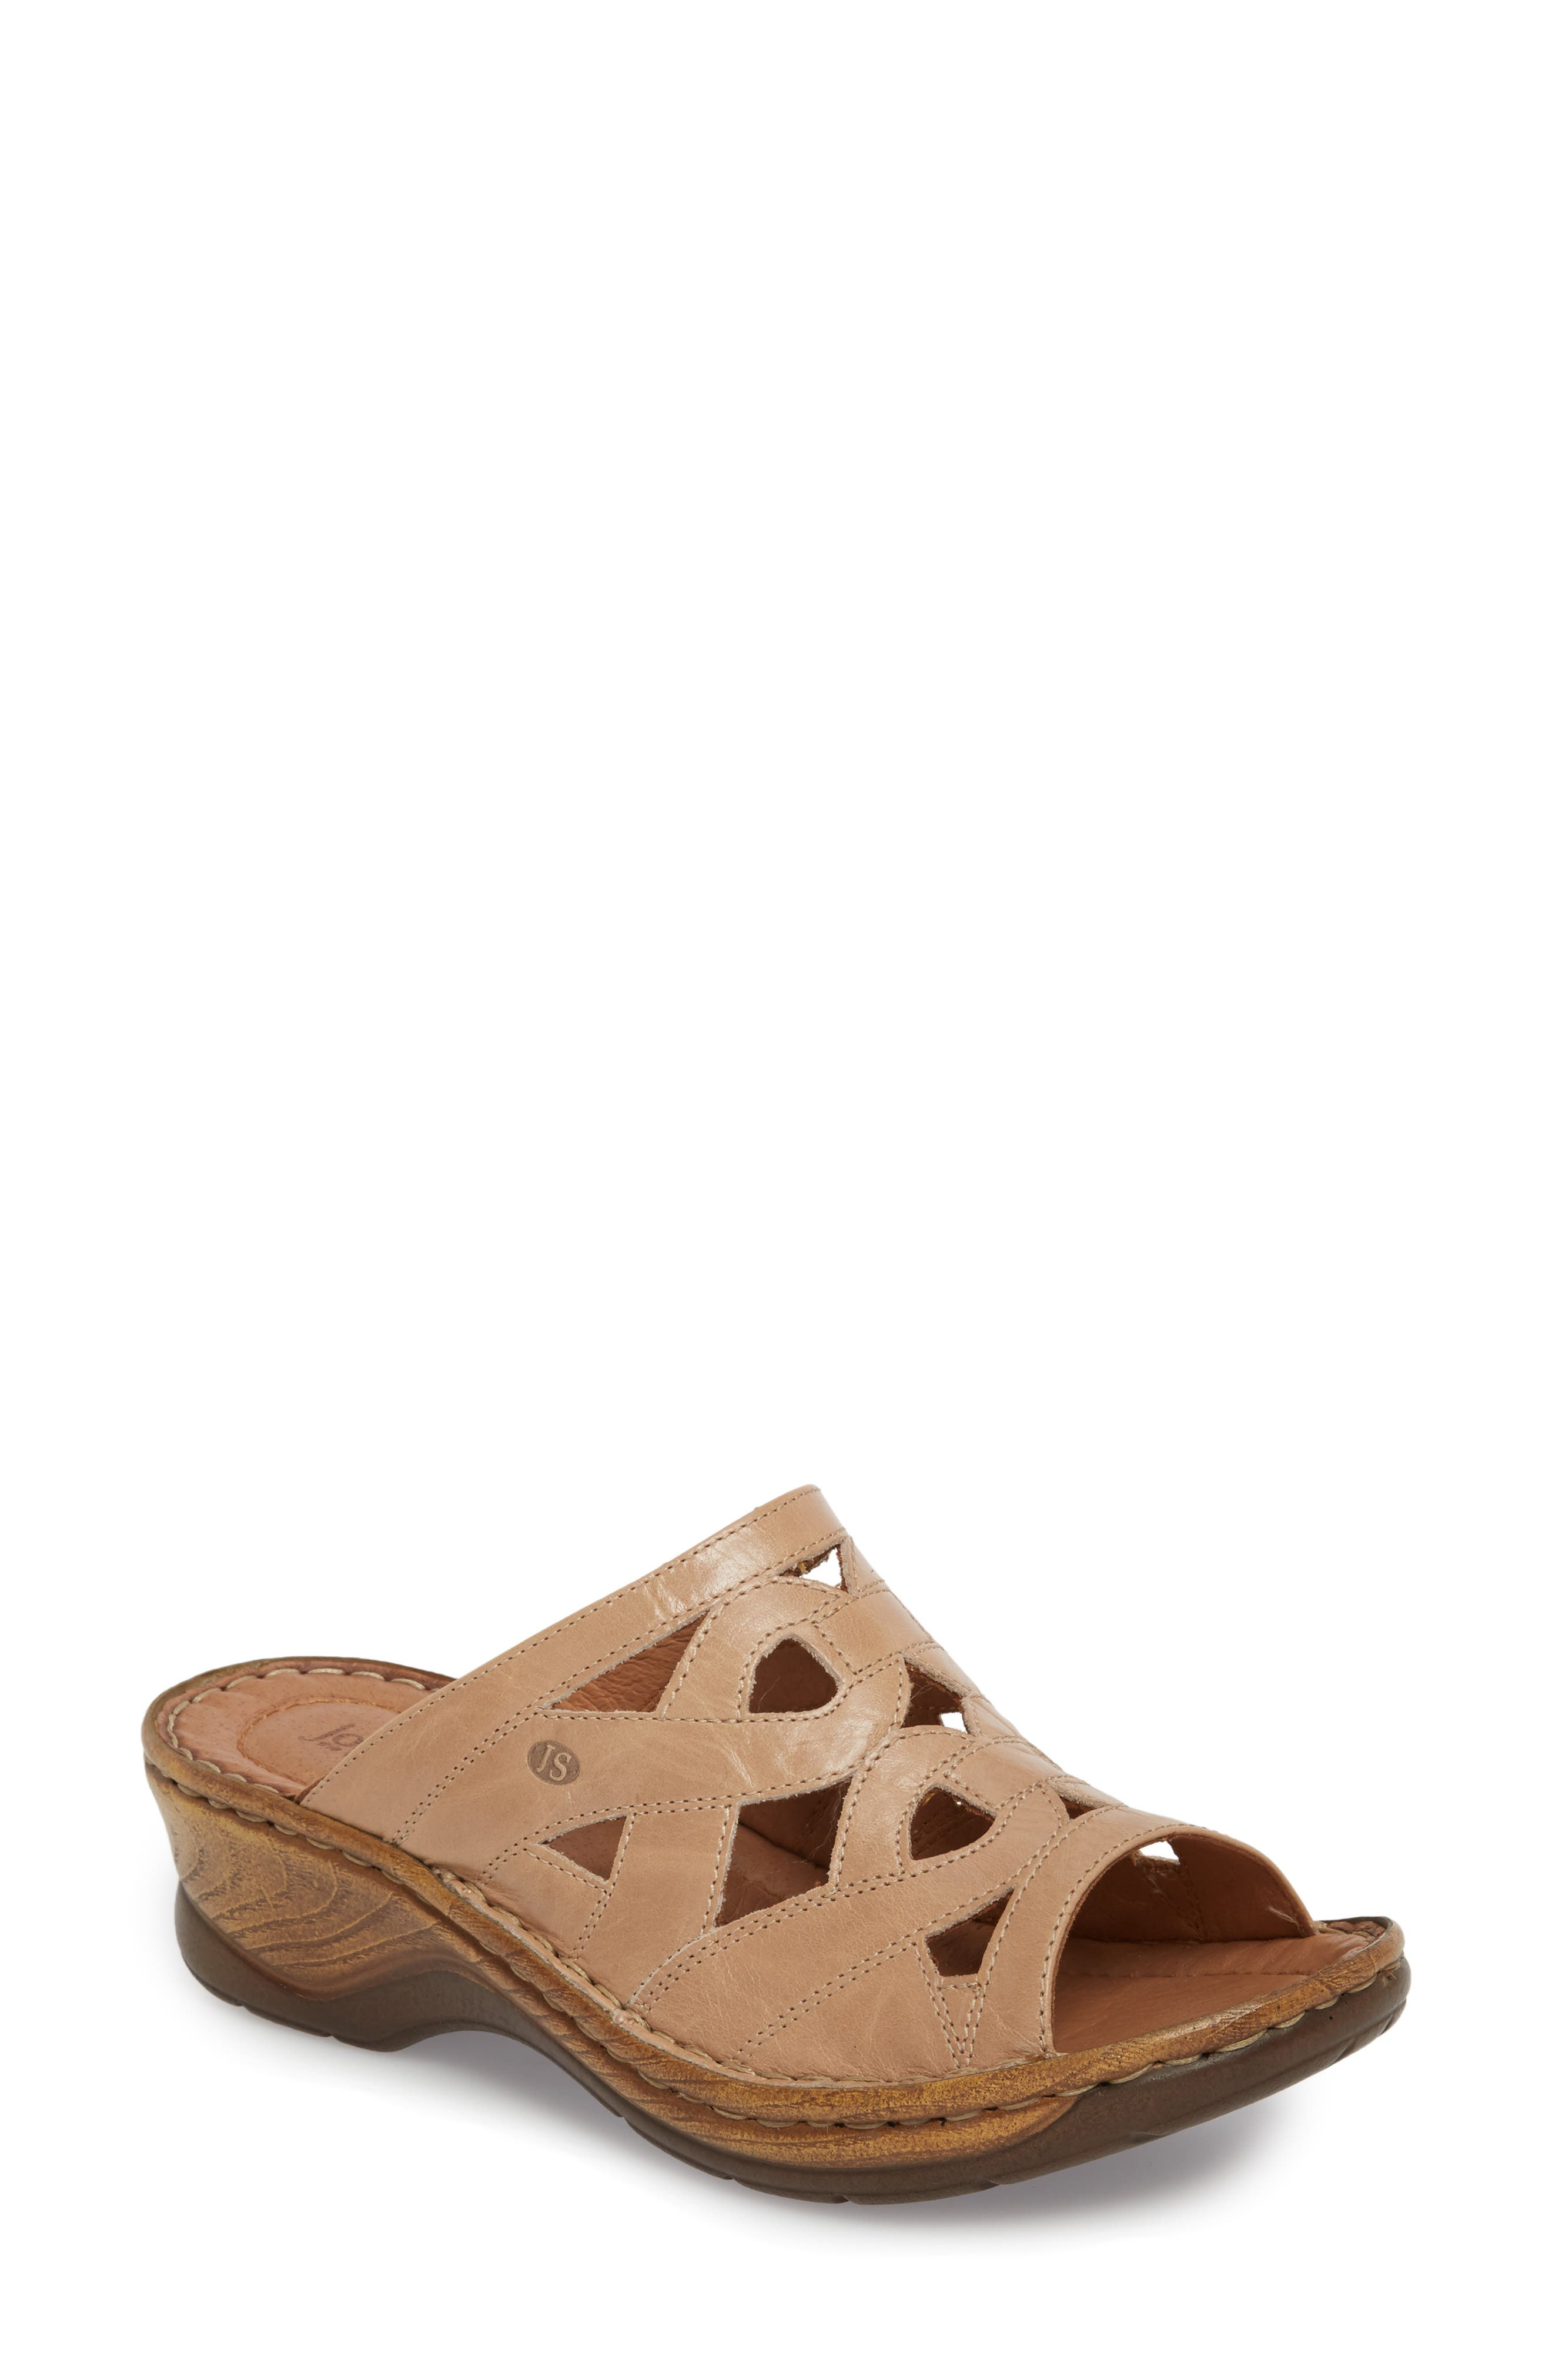 Catalonia 44 Slide Sandal,                         Main,                         color, Beige Leather